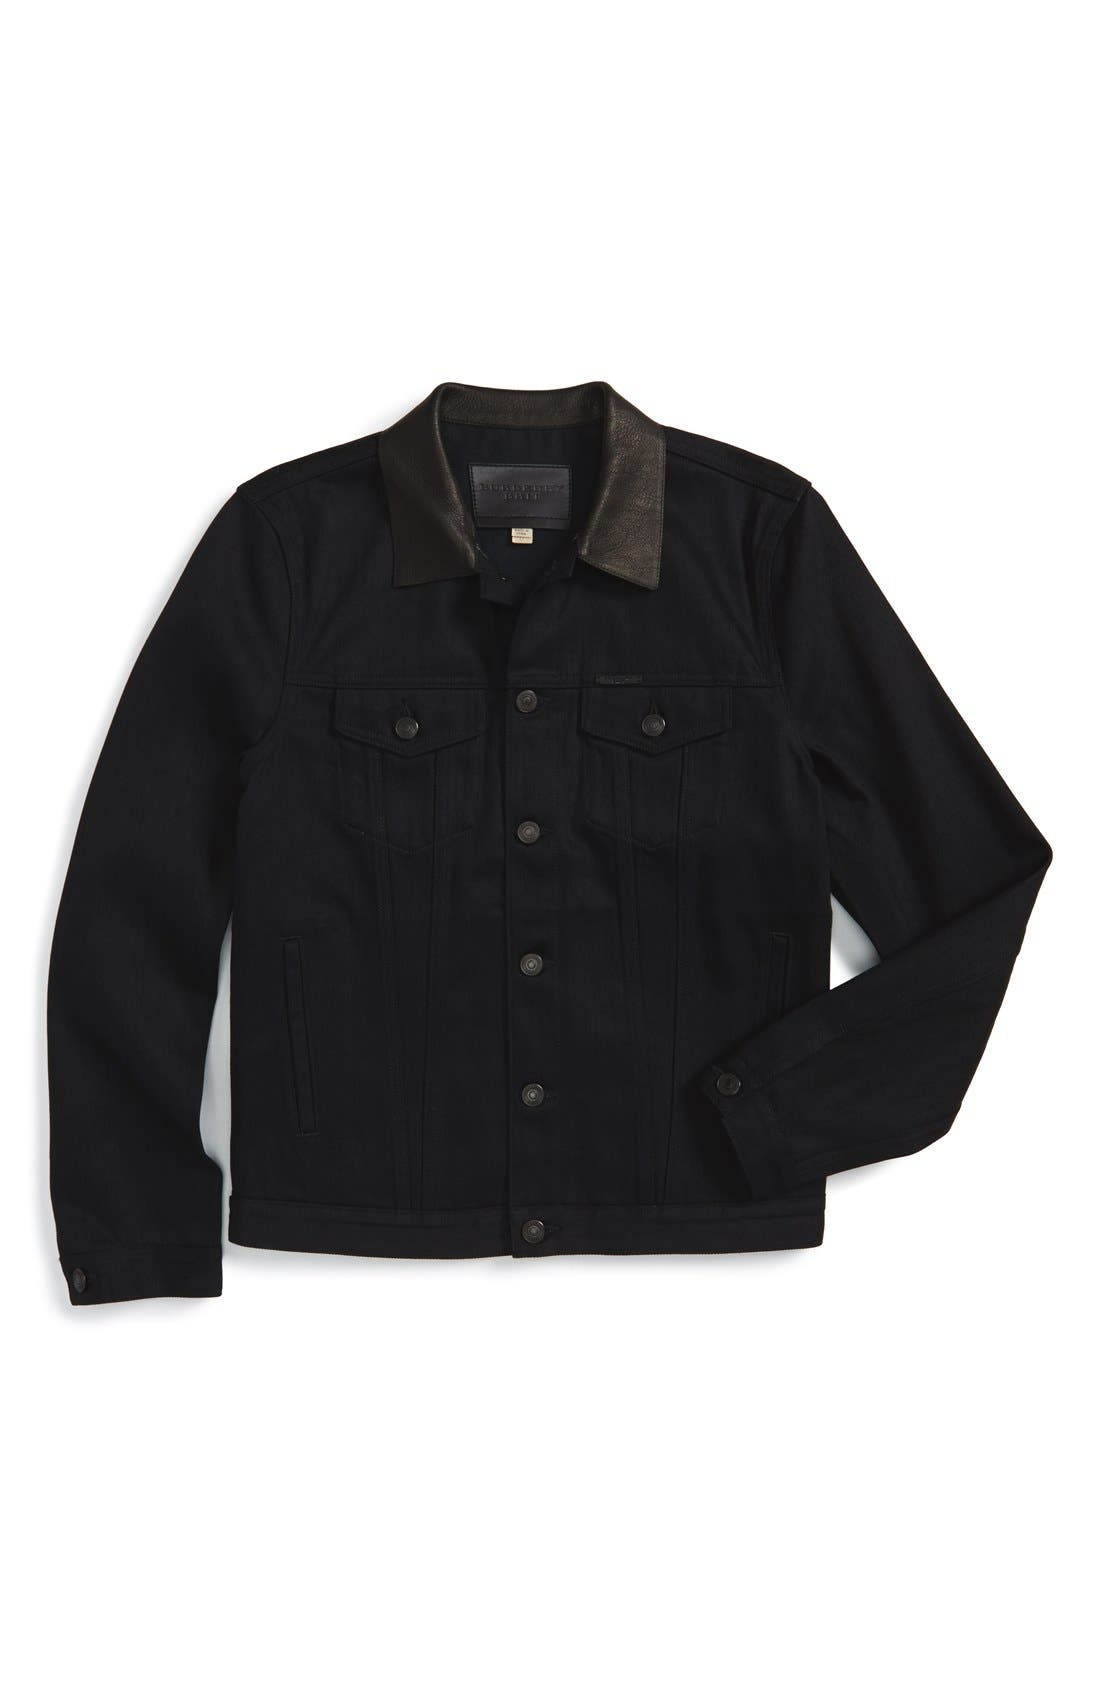 BURBERRY, Brit 'Skipper' Trim Fit Denim Jacket with Leather Collar, Alternate thumbnail 3, color, 001